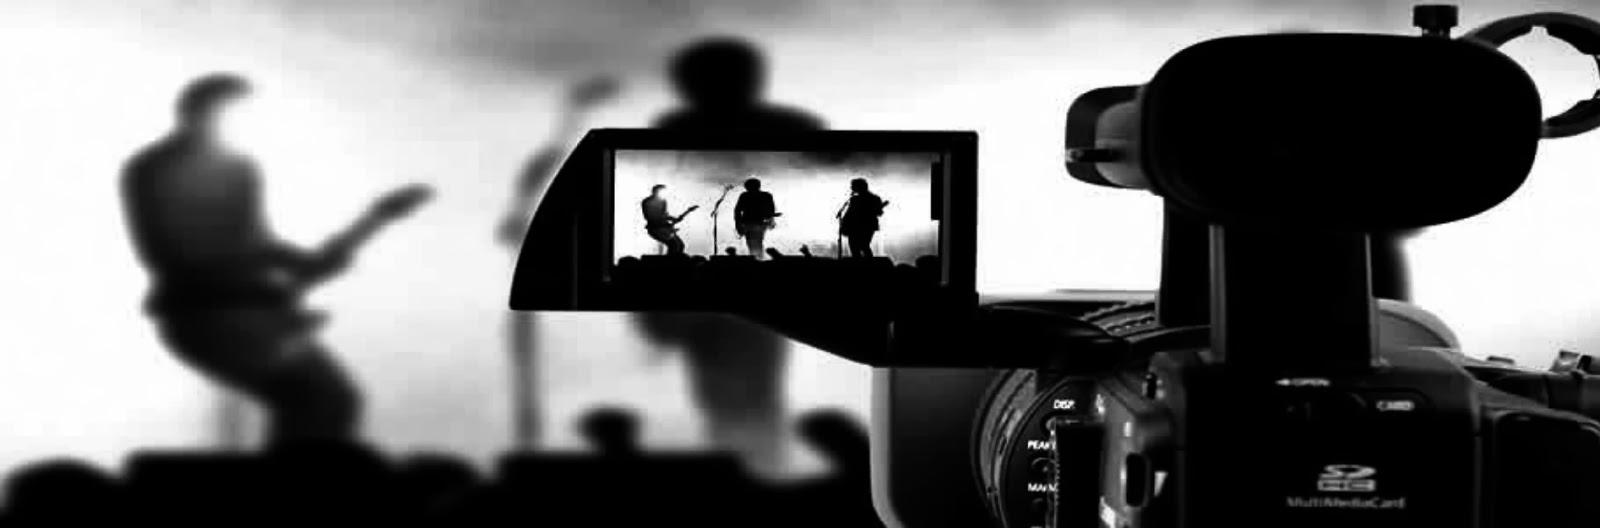 1364356552_470719136_3-Filmacion-fotografia-sonido-matrimonios-eventos-produccion-audiovisual-Planeamiento-de-eventos1